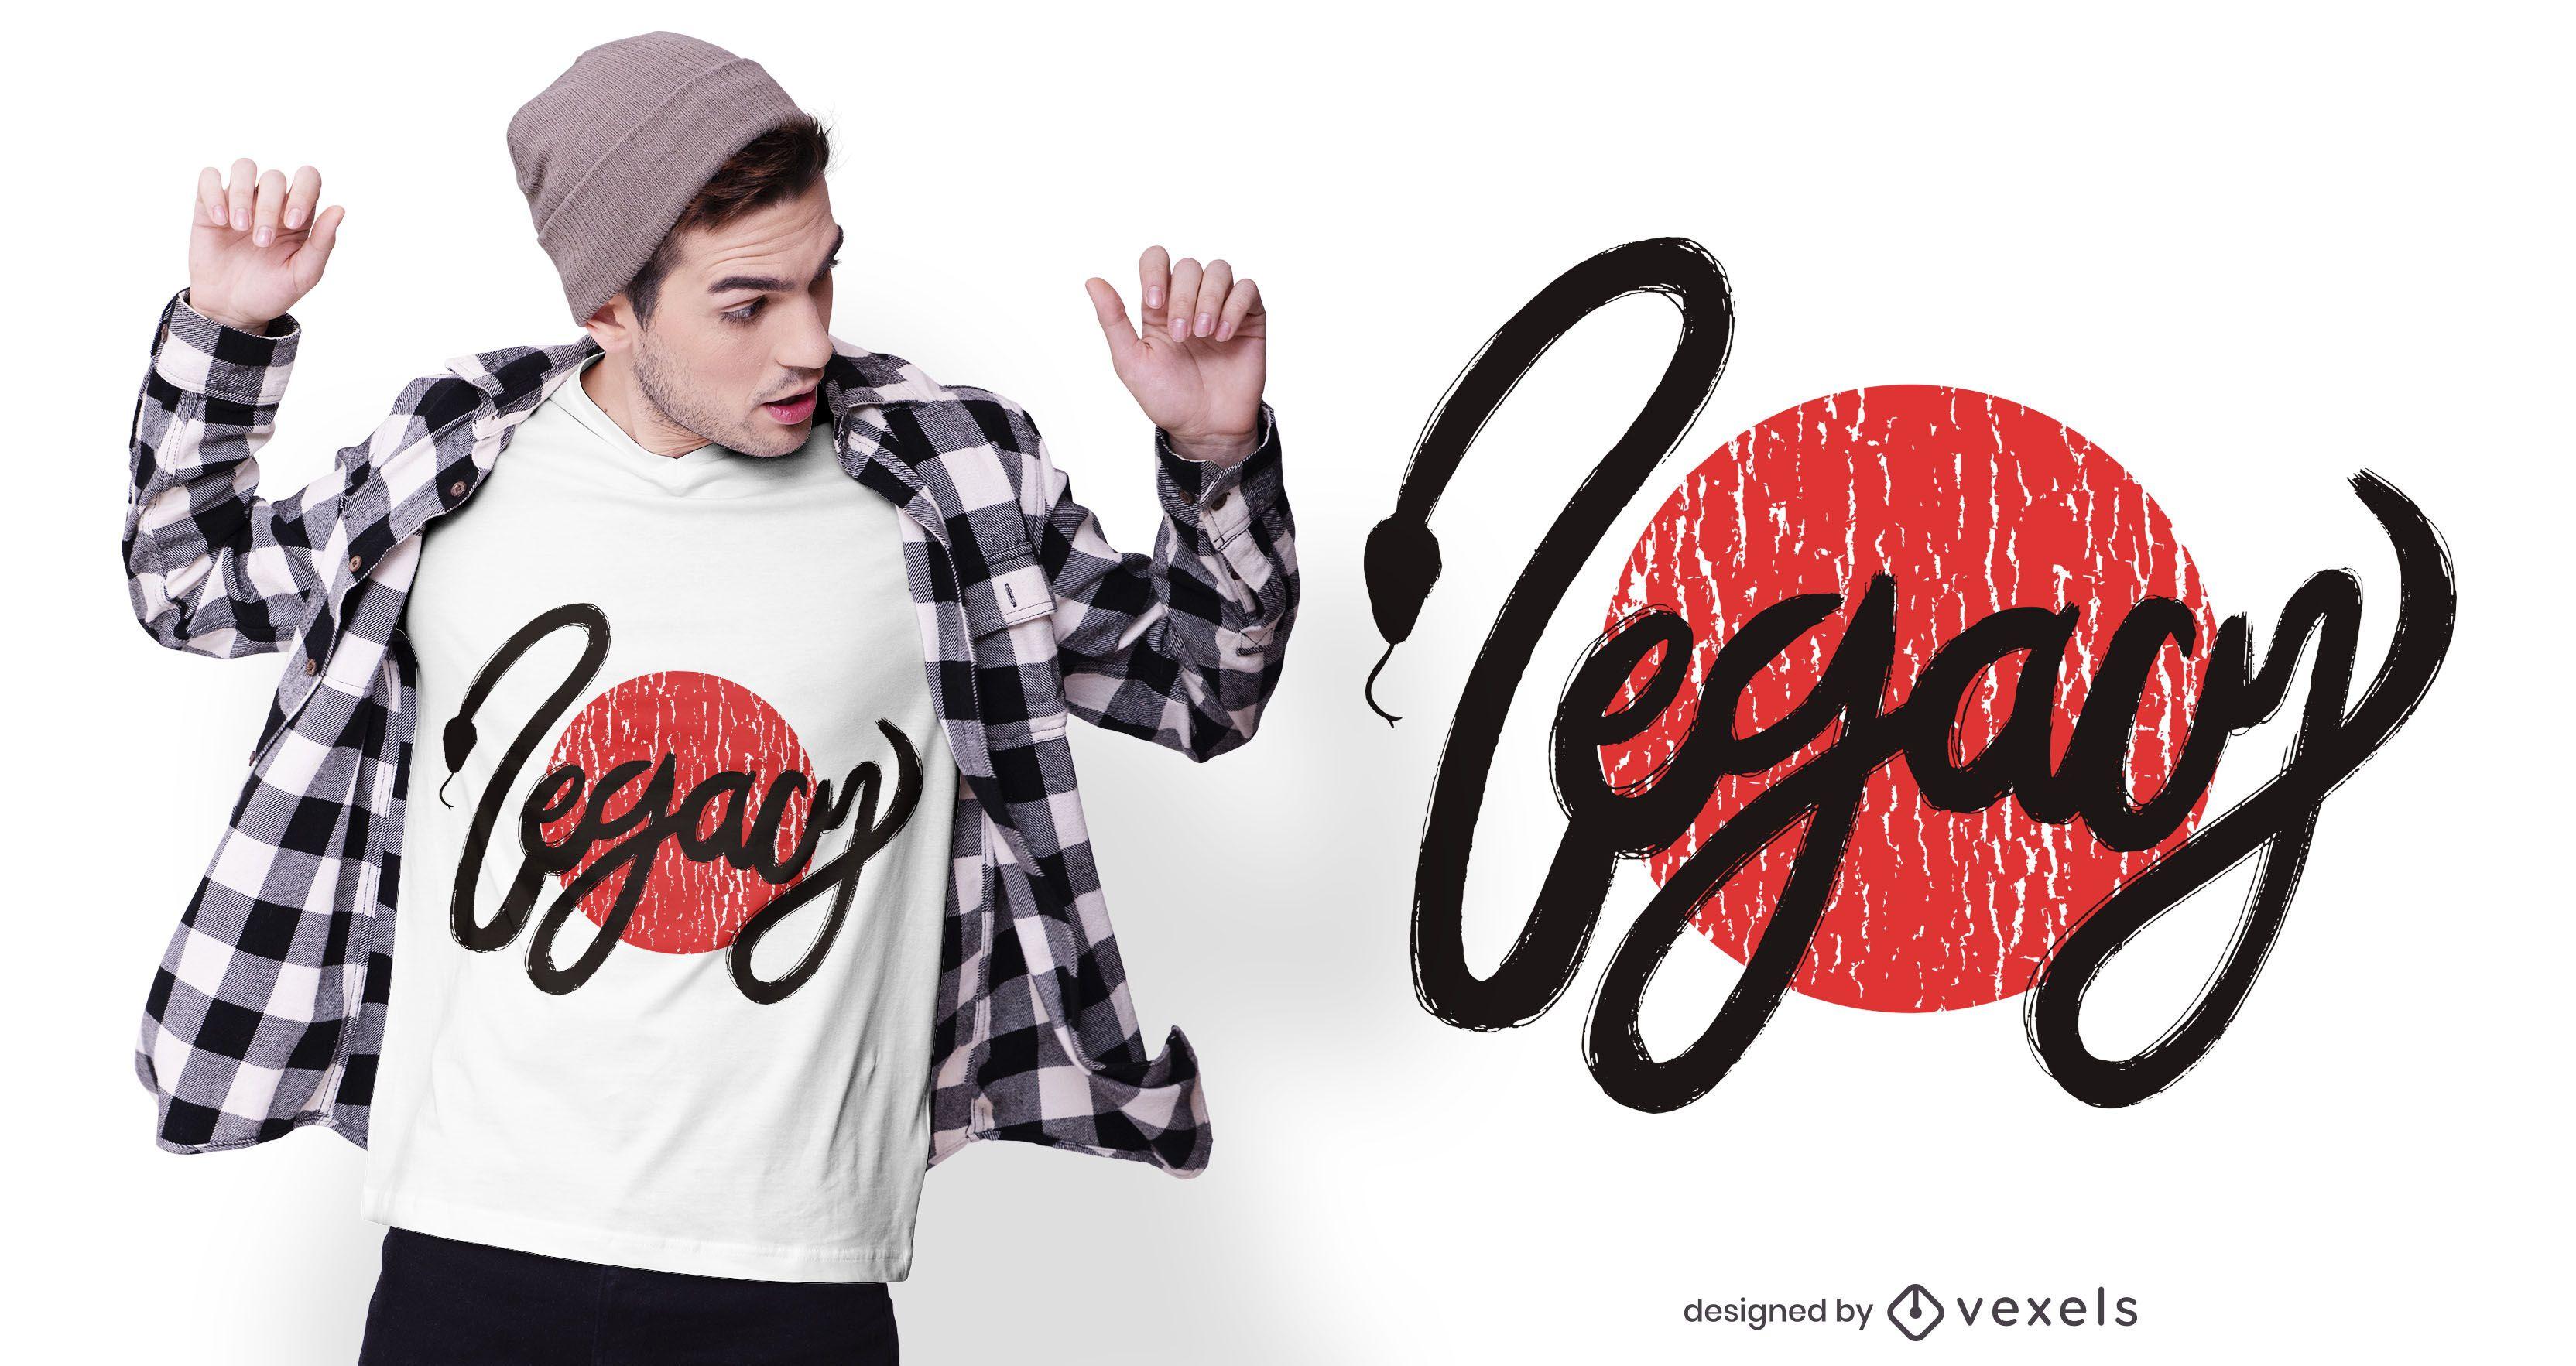 Legacy snake t-shirt design